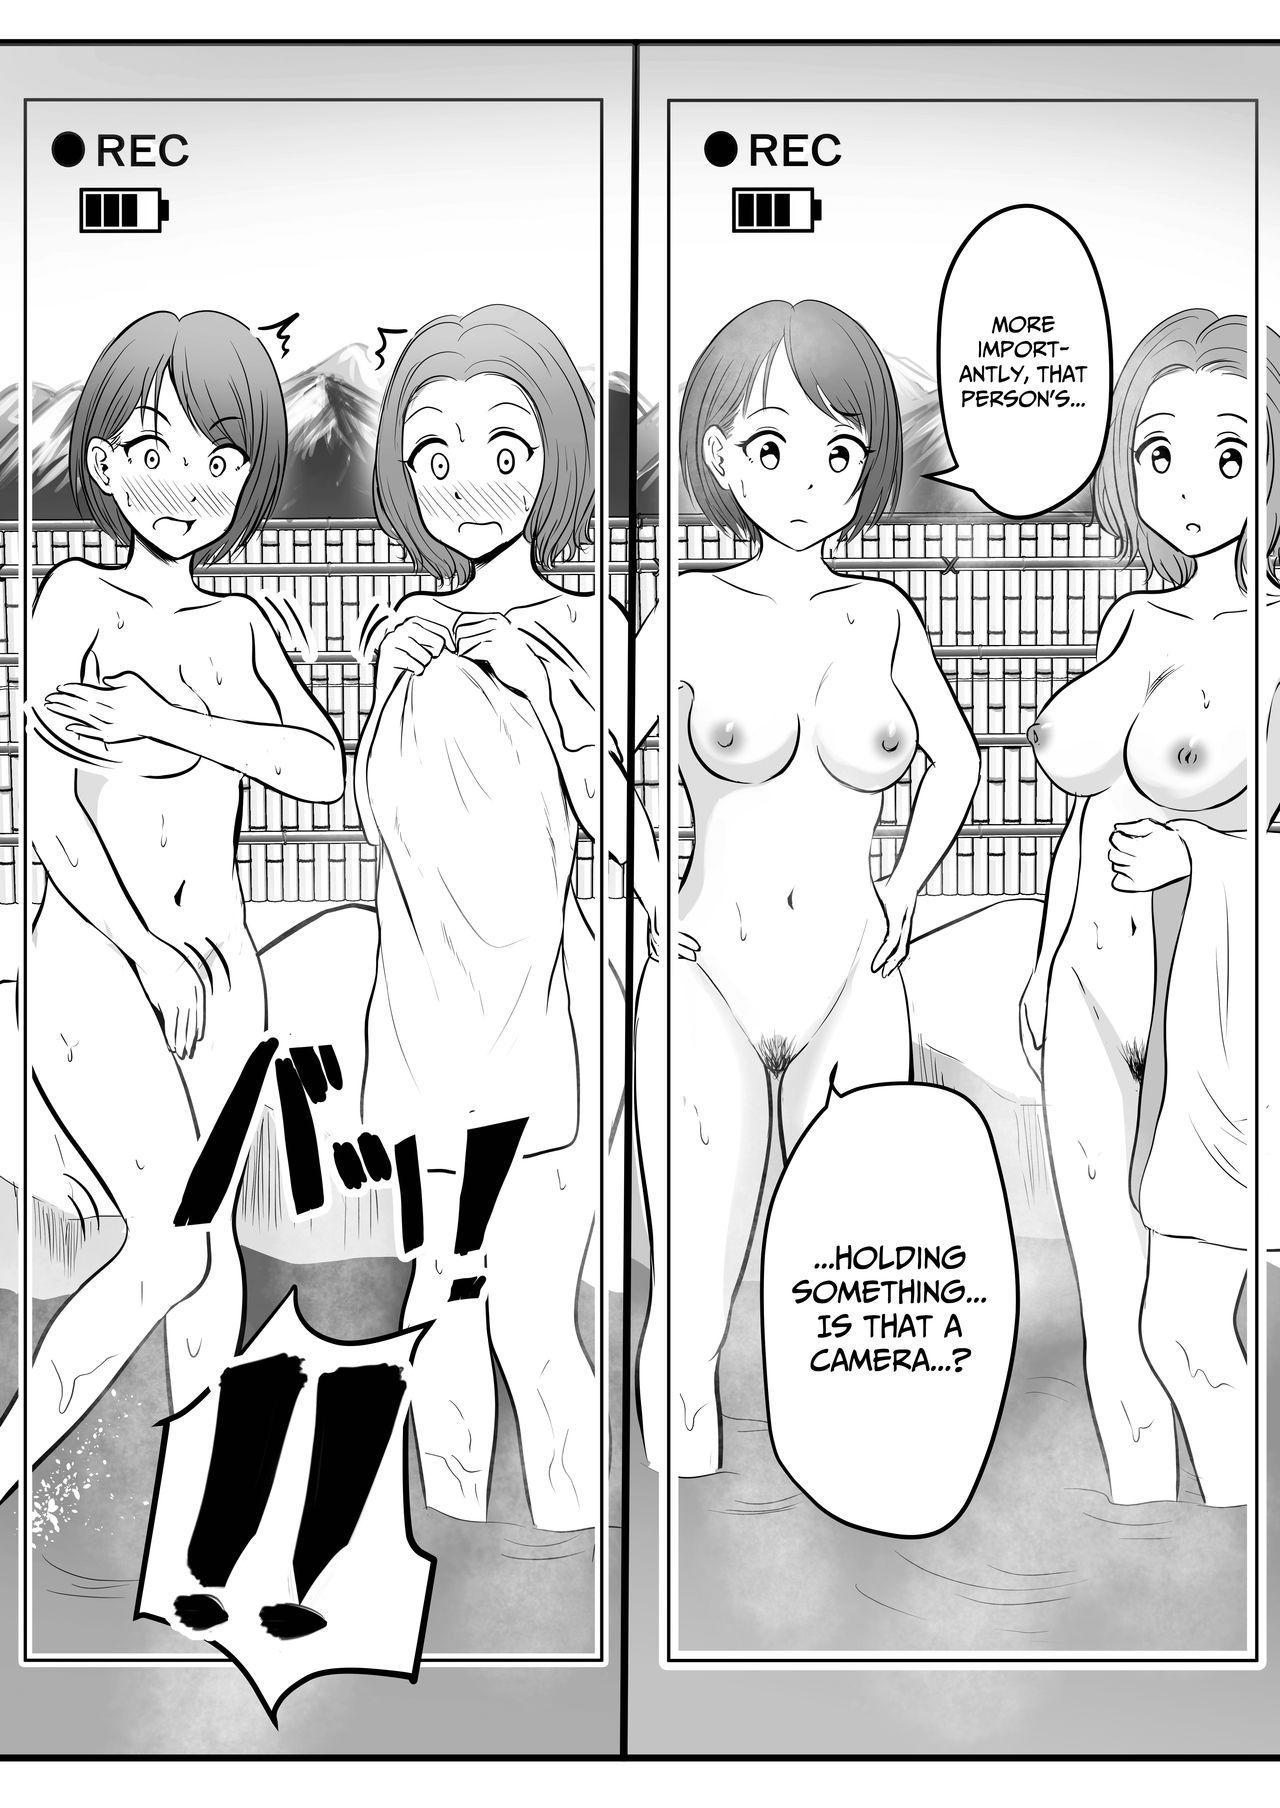 Onsen Ryokan de Zurineta Shuushuu Mission! | The Hot Springs Inn Fap Material Gathering Mission! 6